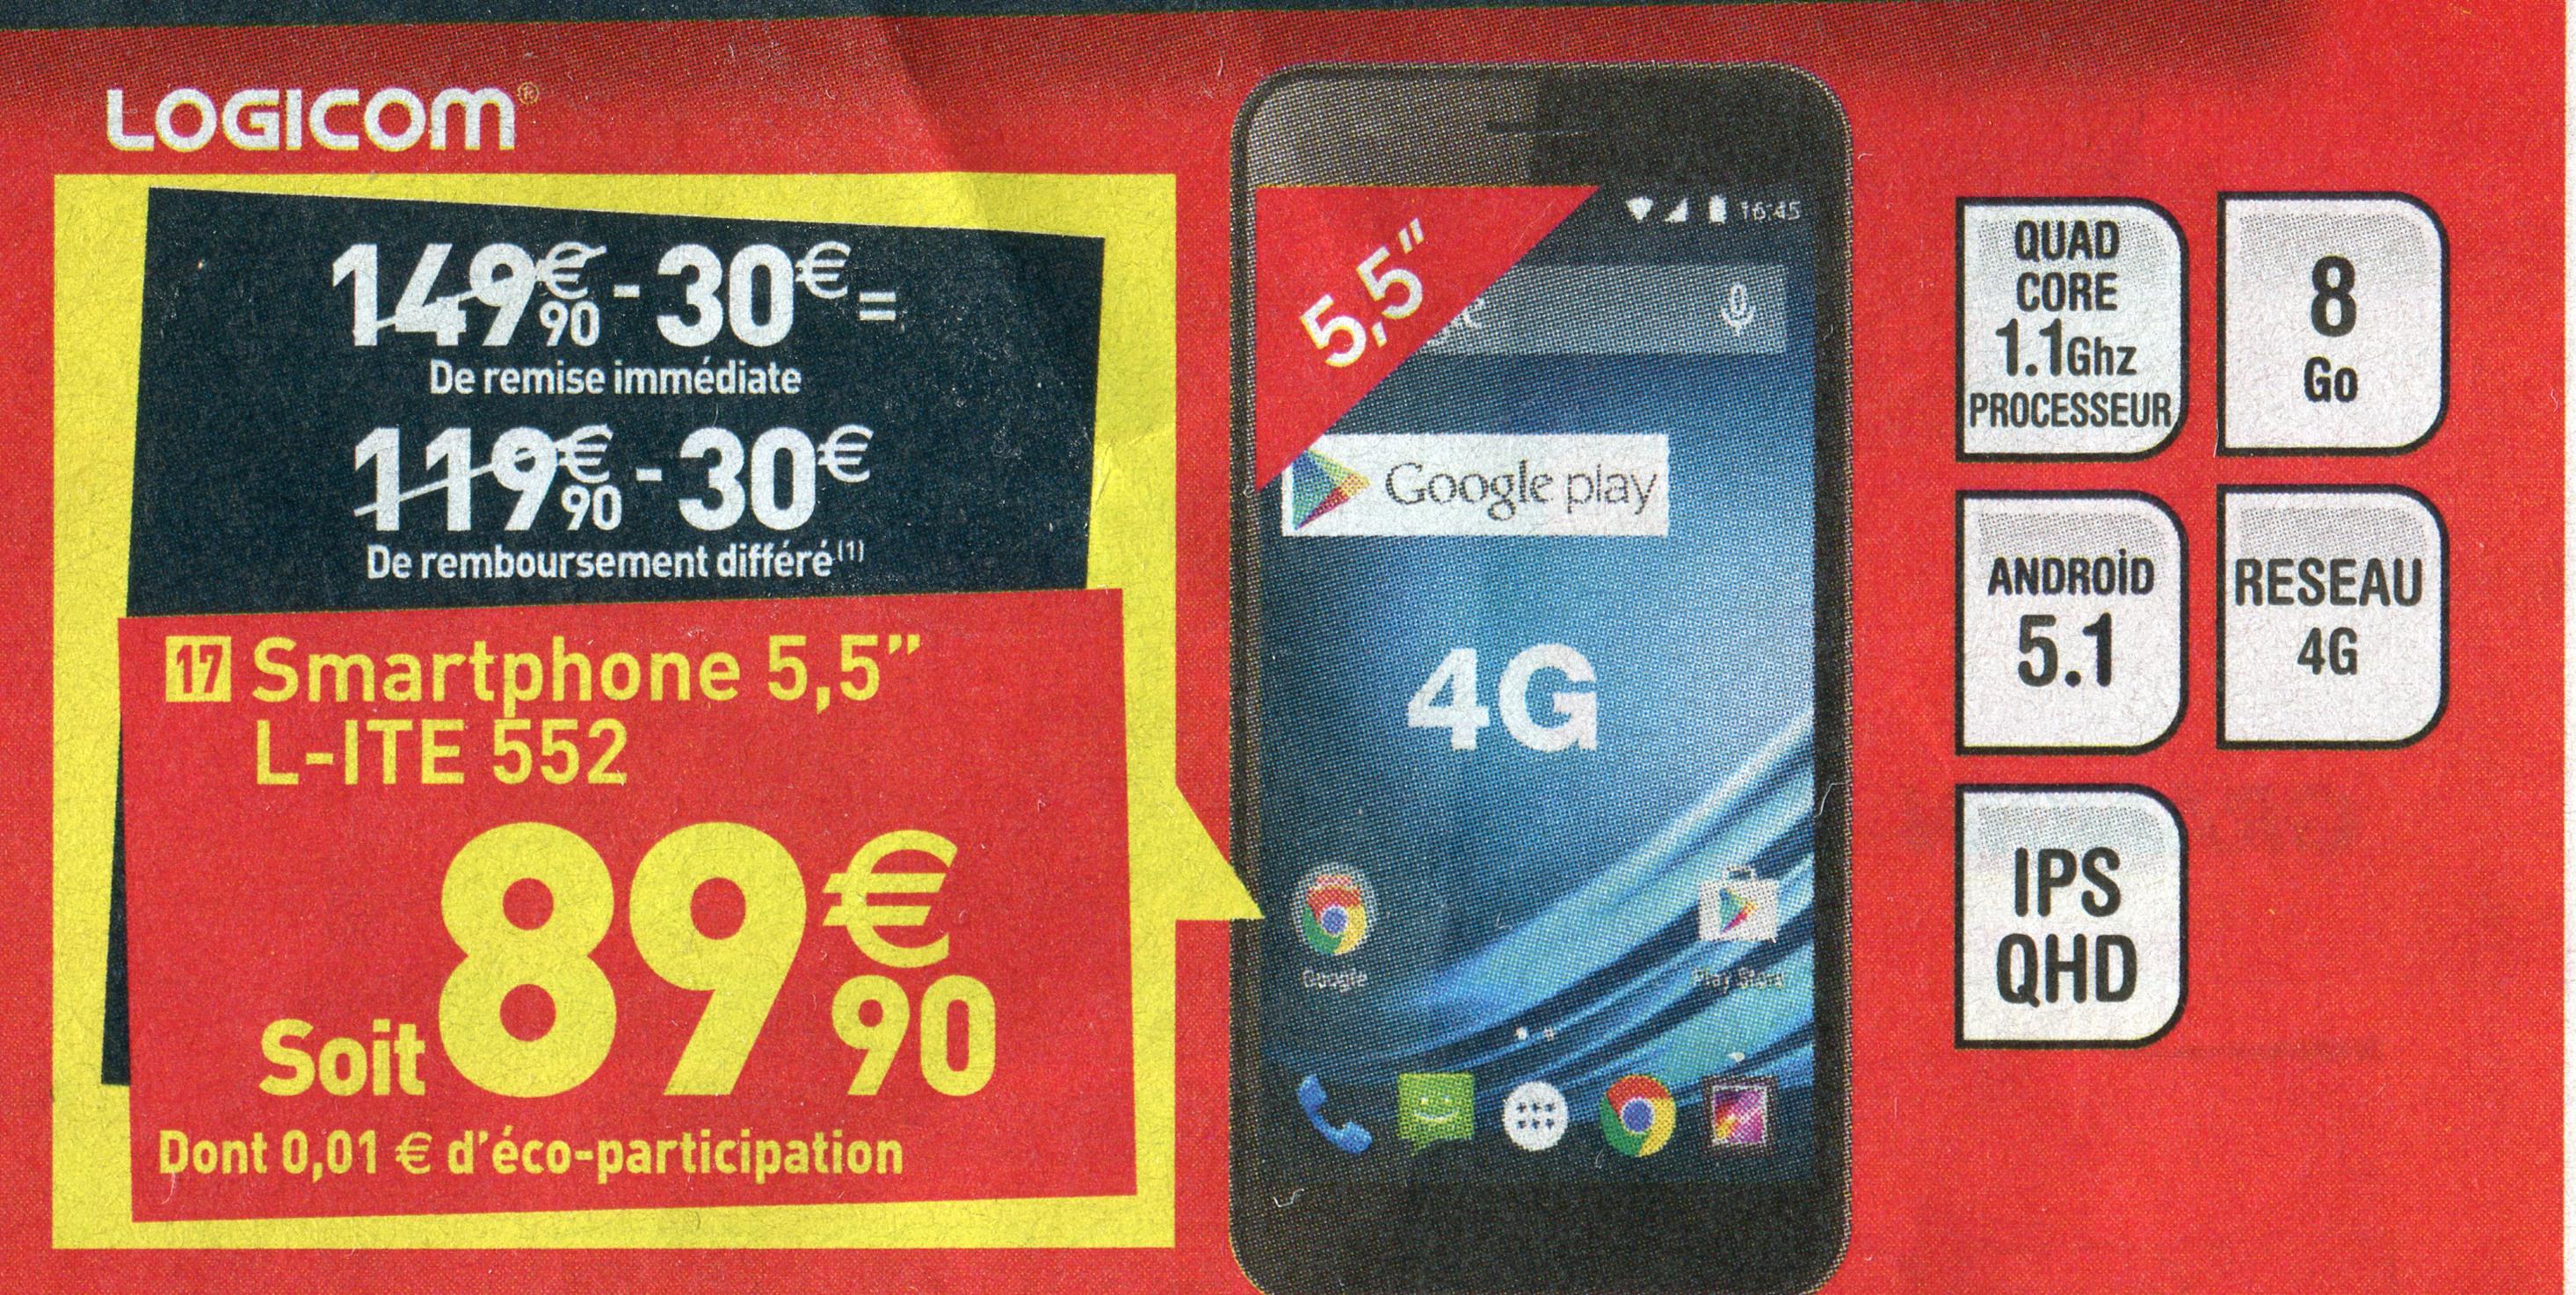 "Logicom L-ITE 552 - Ecran 5.5"" IPS - 4G - Android 5.1 Lollipop - Quad Core"